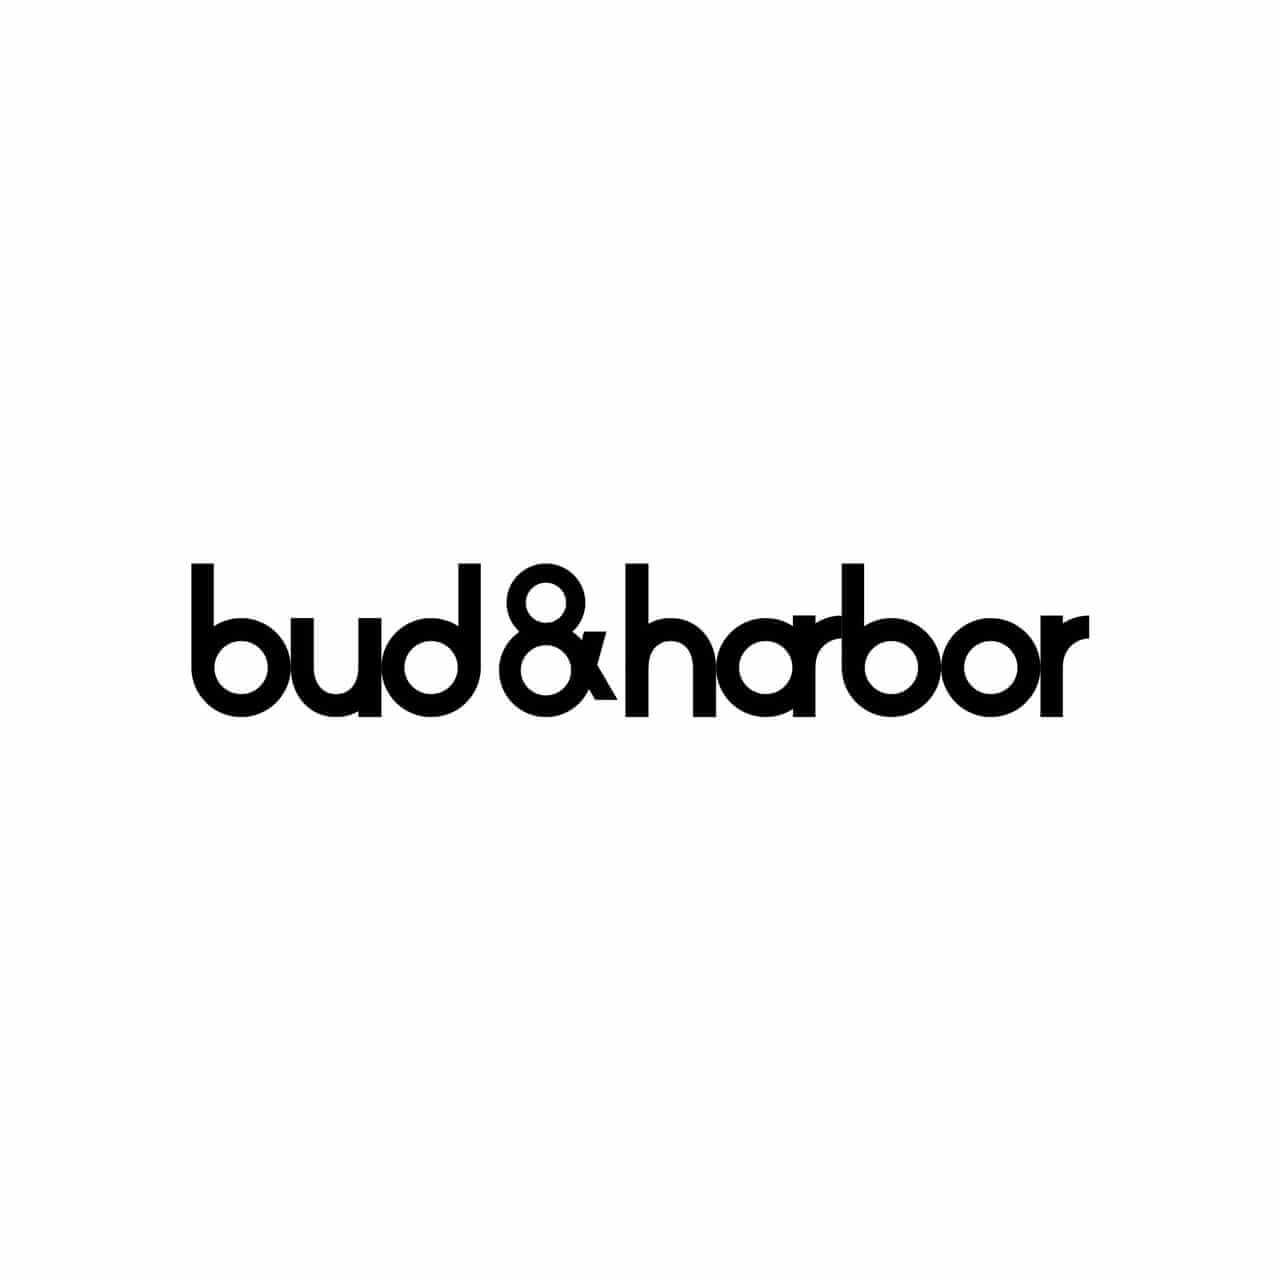 bud&harbor インタビュー